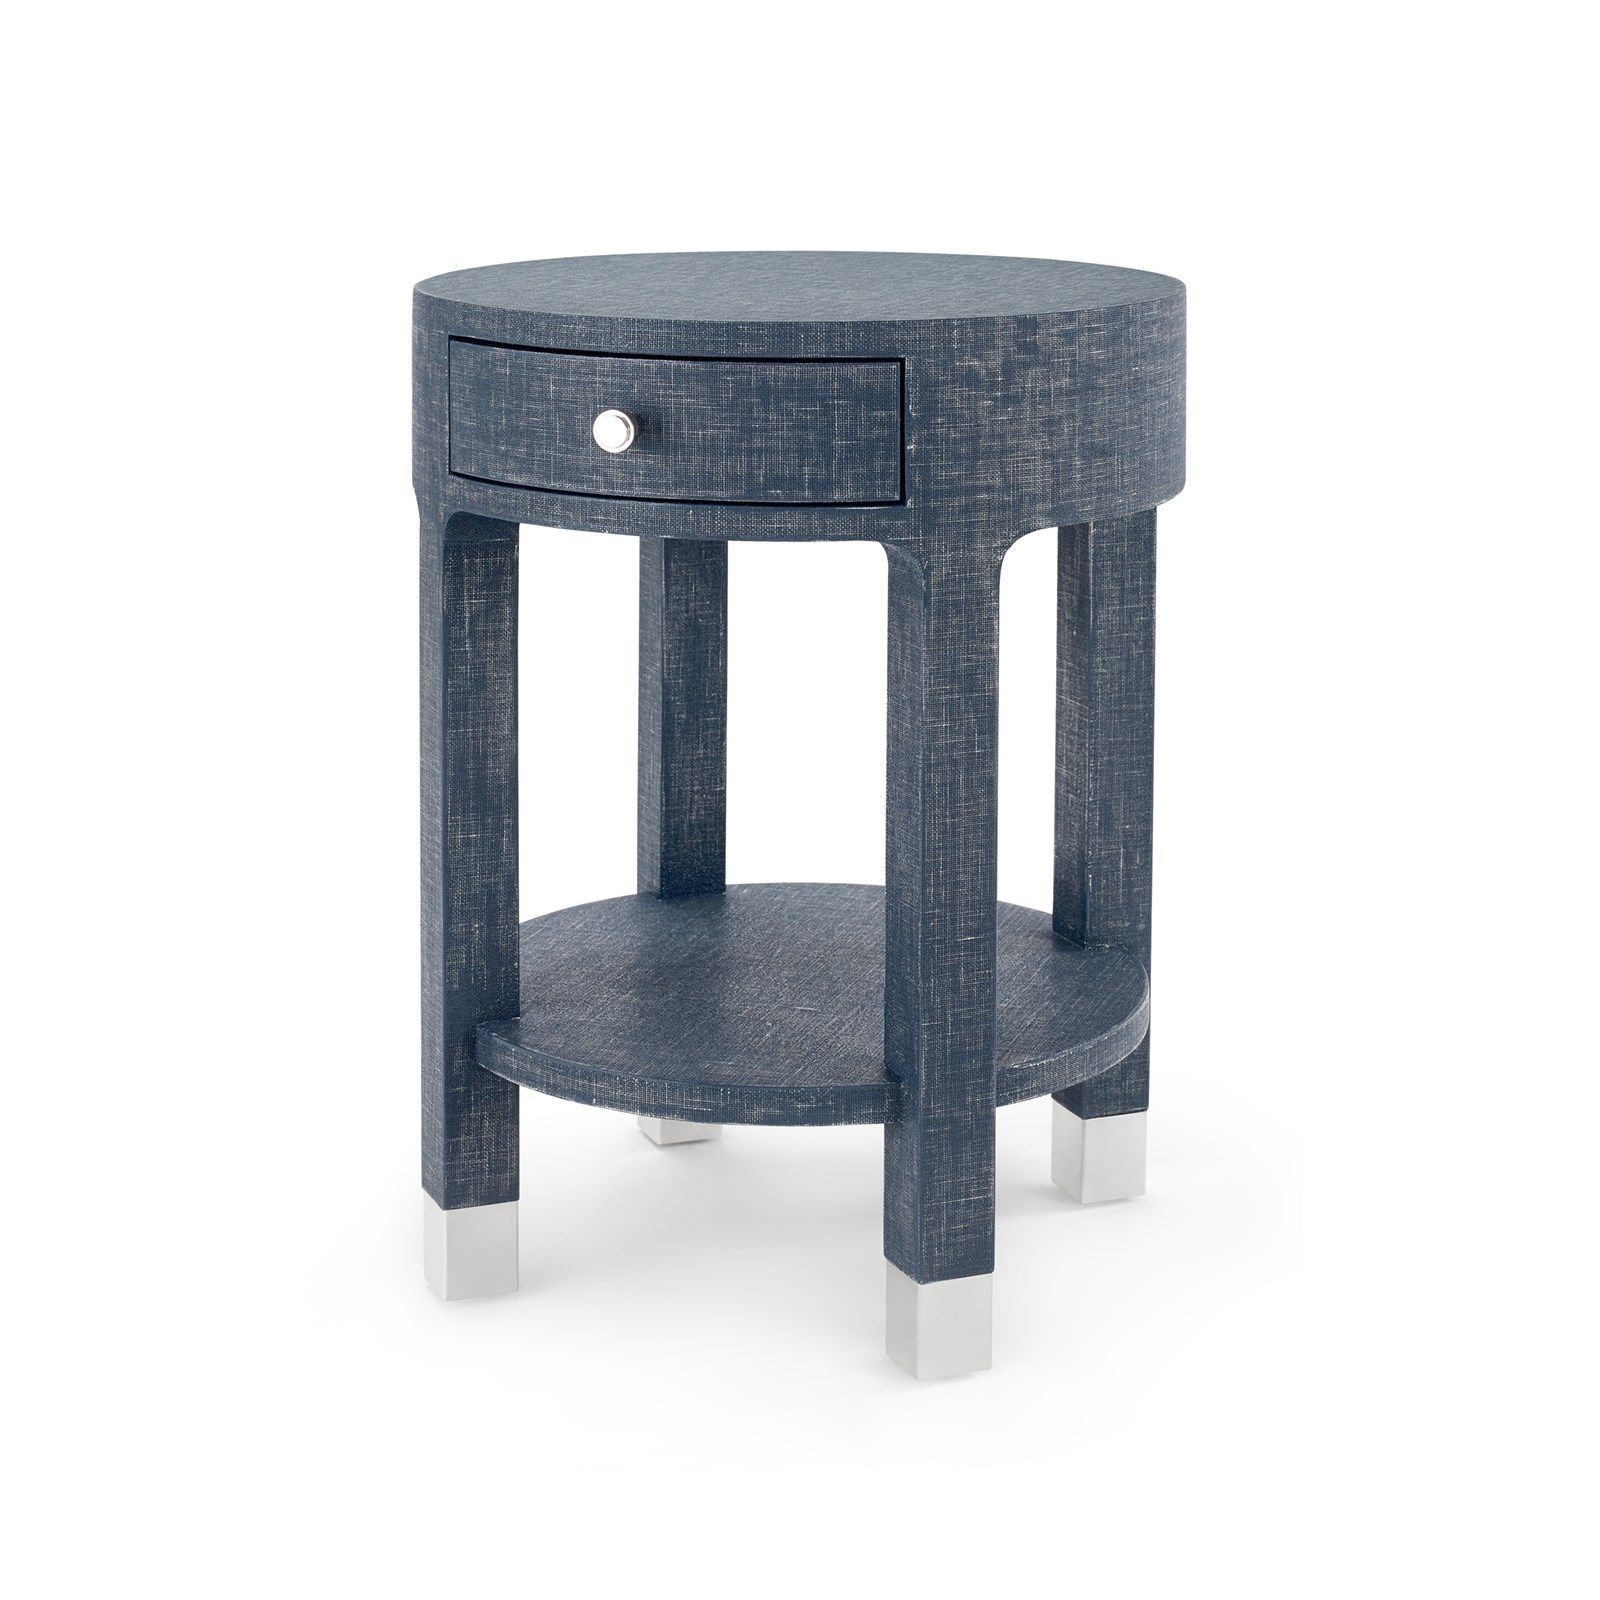 Best Dakota 1 Drawer Round Side Table Navy Blue Bungalow 5 400 x 300